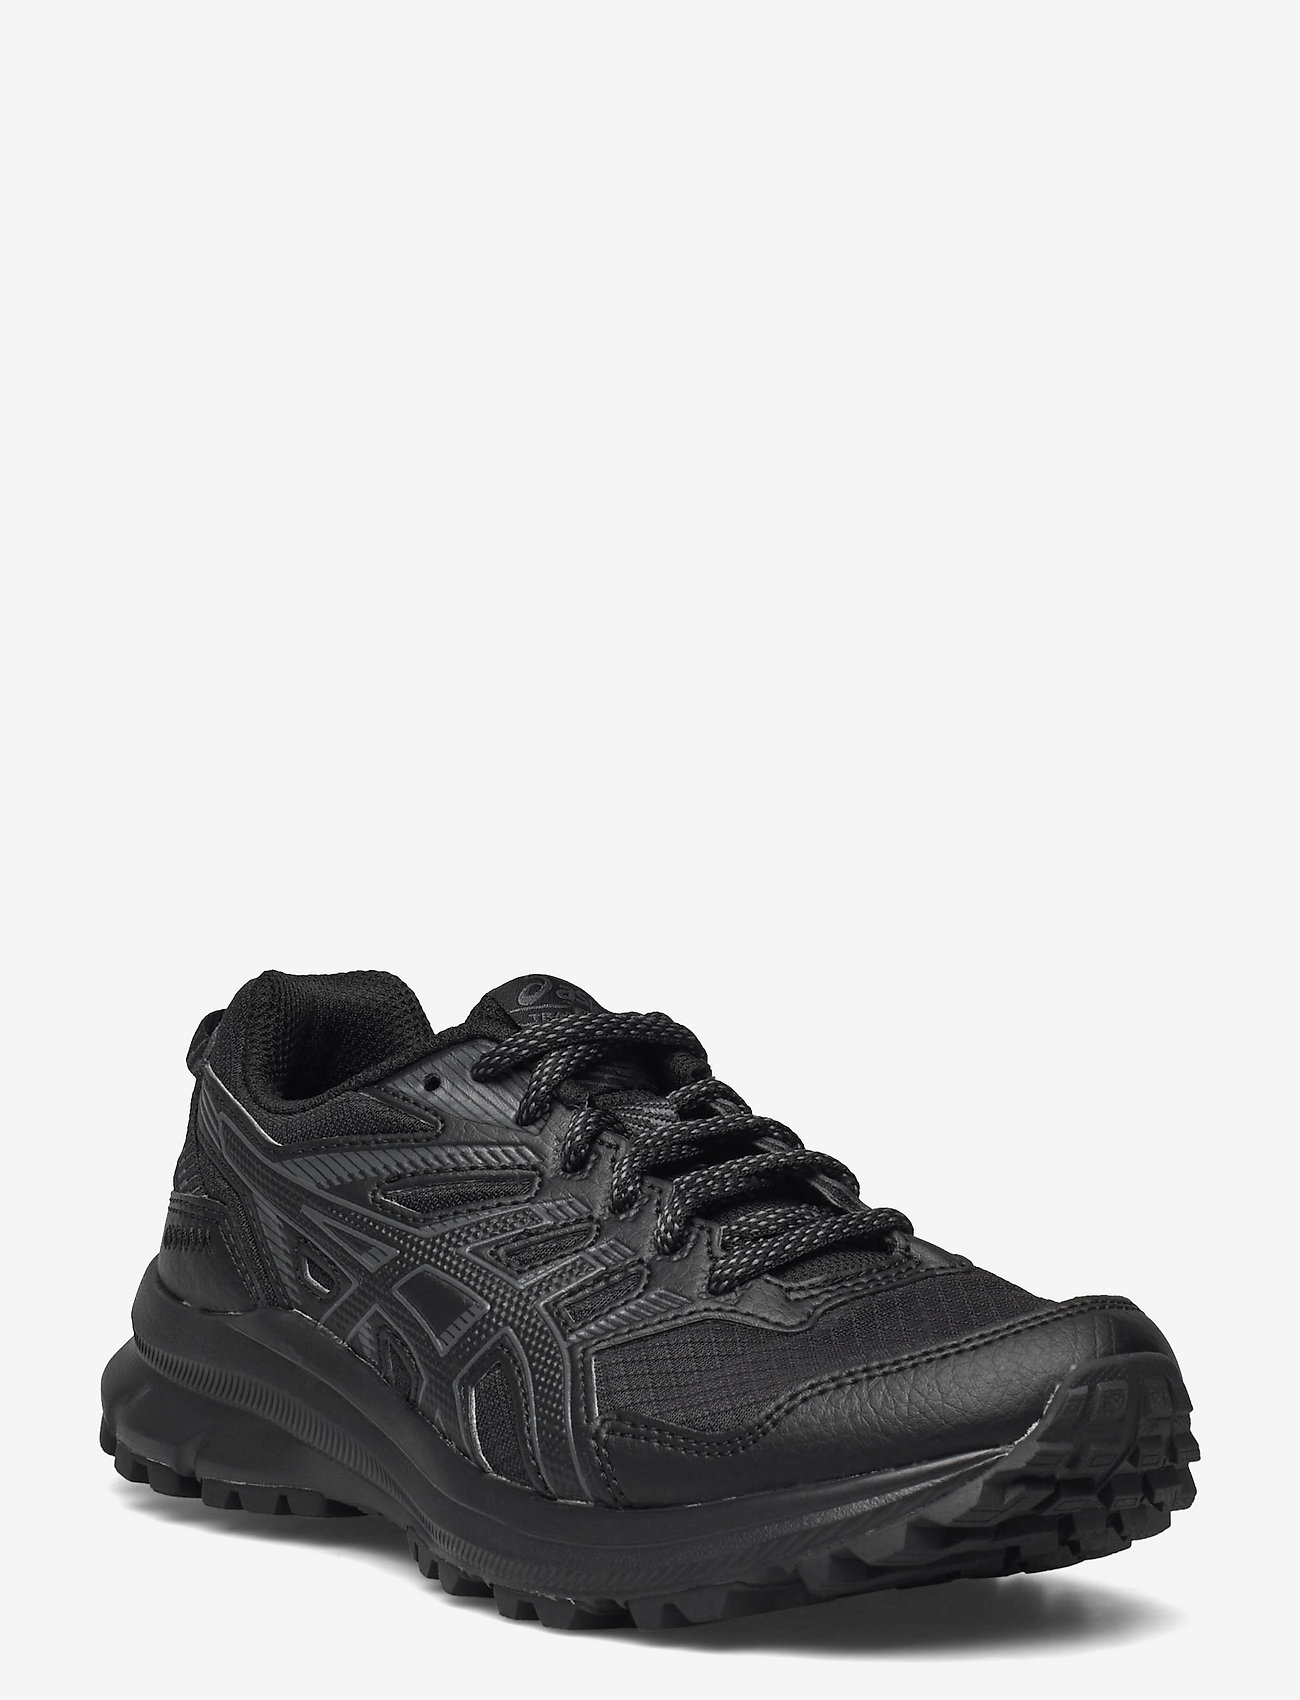 Asics Trail Scout 2 - Sport shoes | Boozt.com